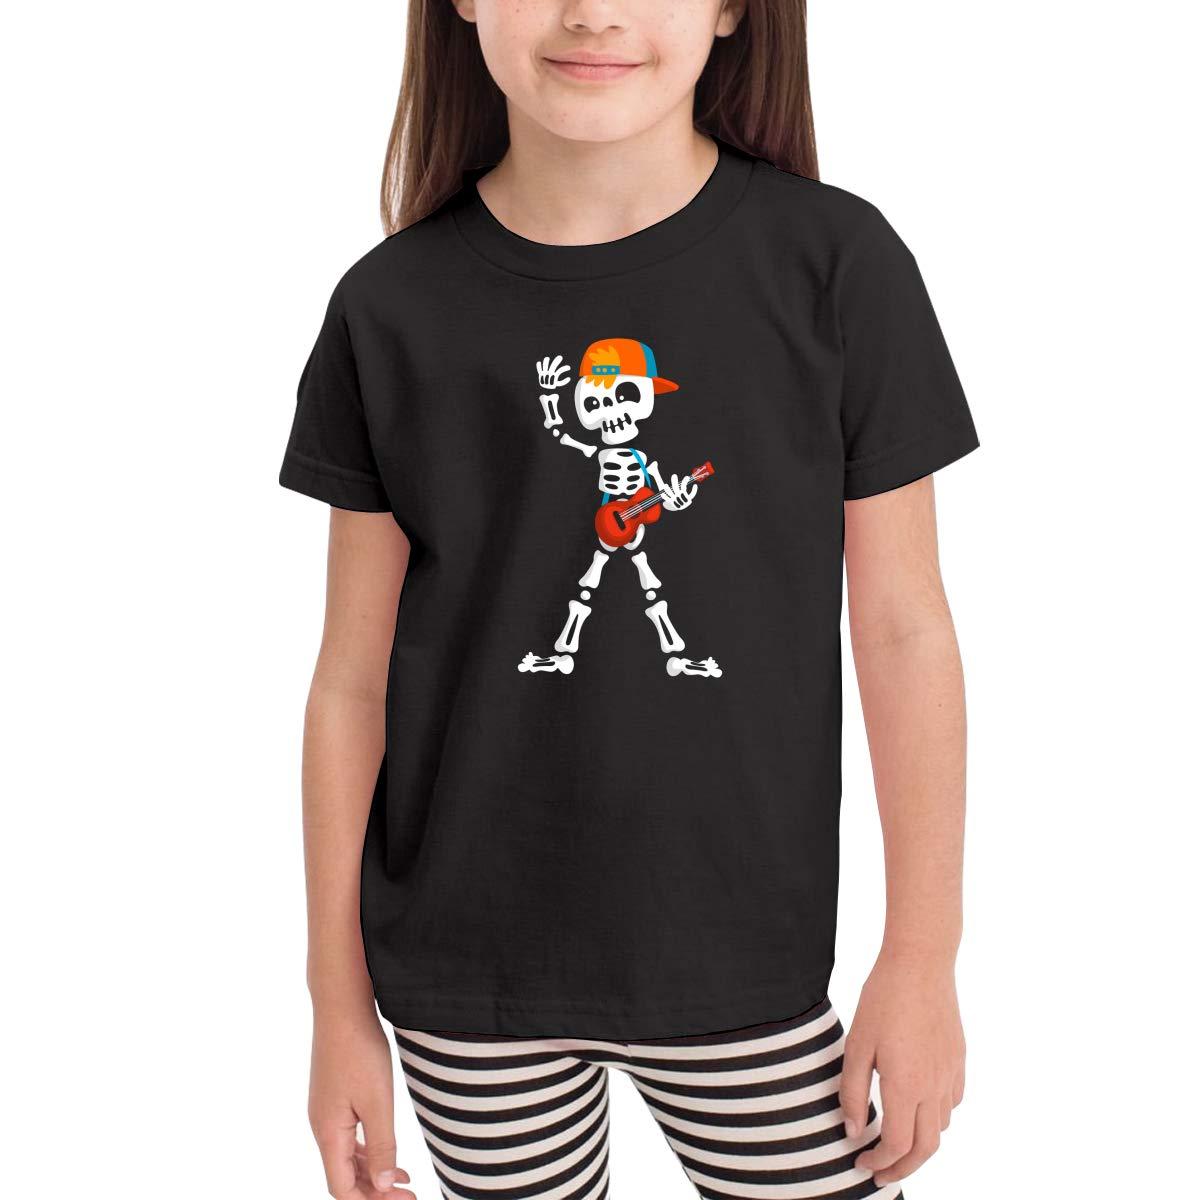 Onlybabycare Creepy Skeleton Playing Guitar Toddler Boys Girls Short Sleeve T Shirt